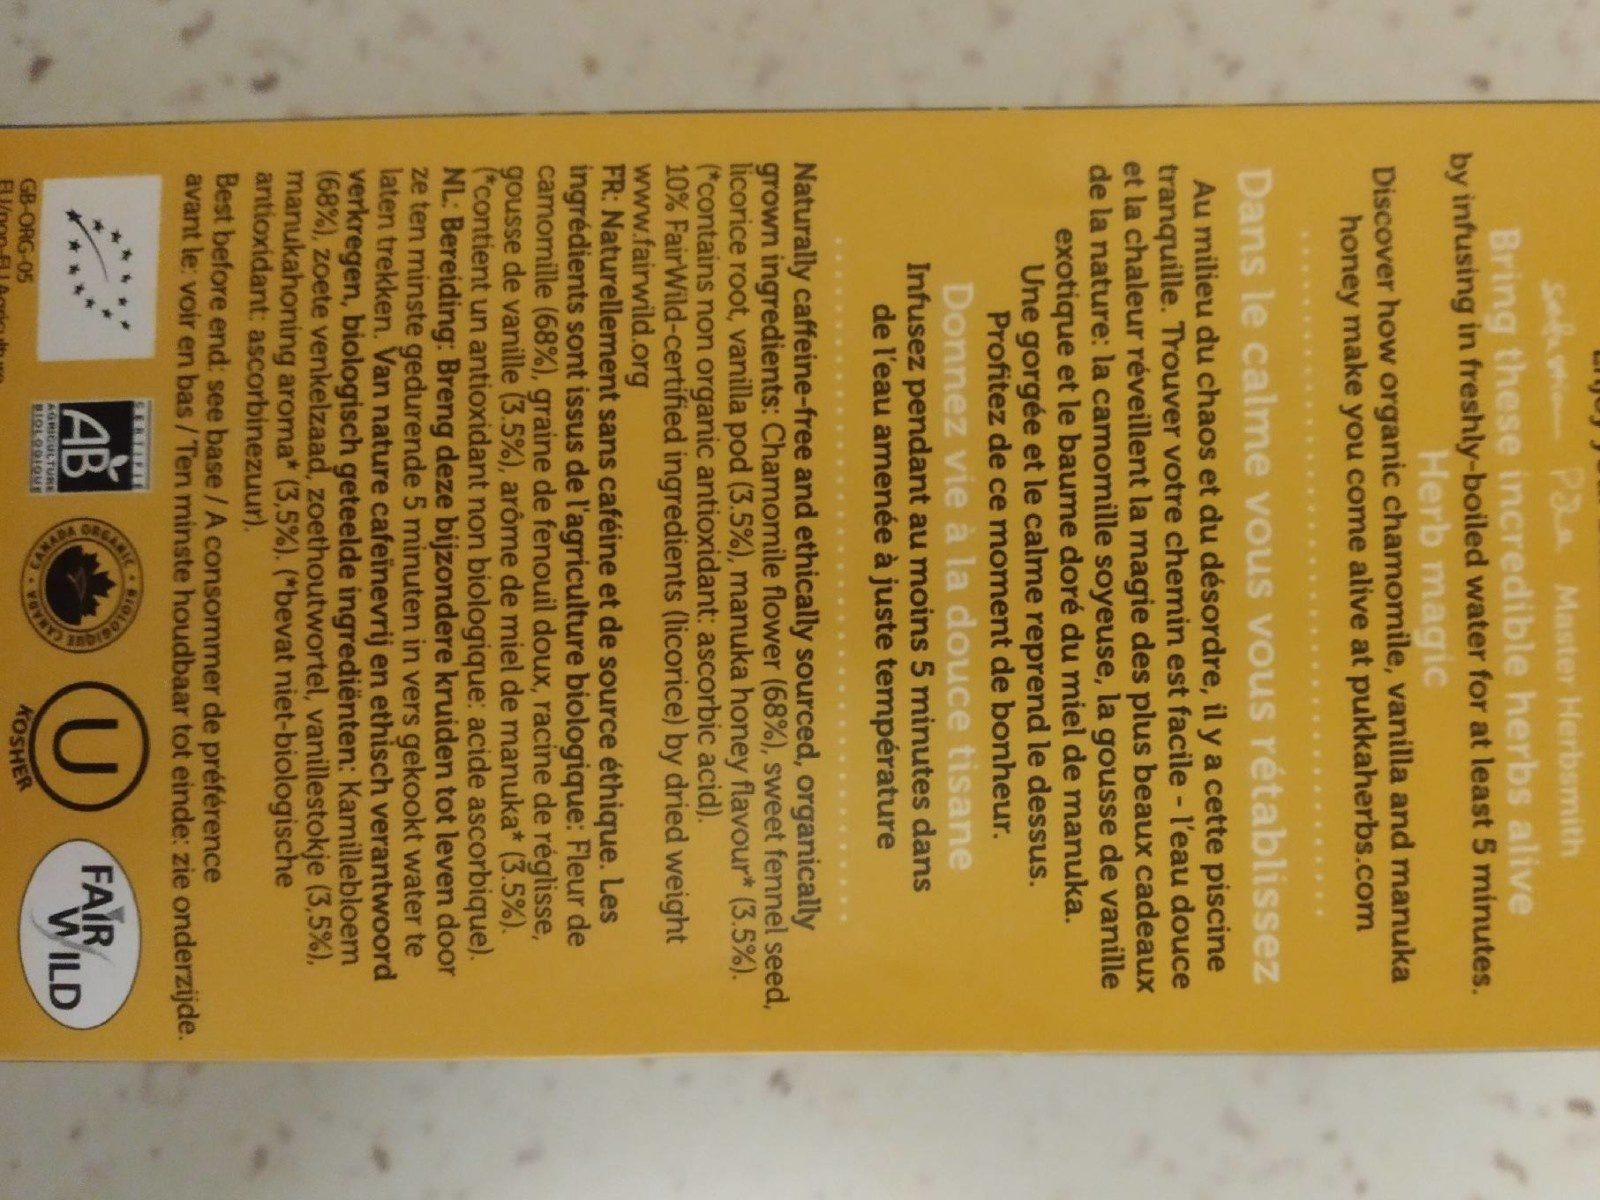 Chamomille, vanilla & manuka honey - Ingredients